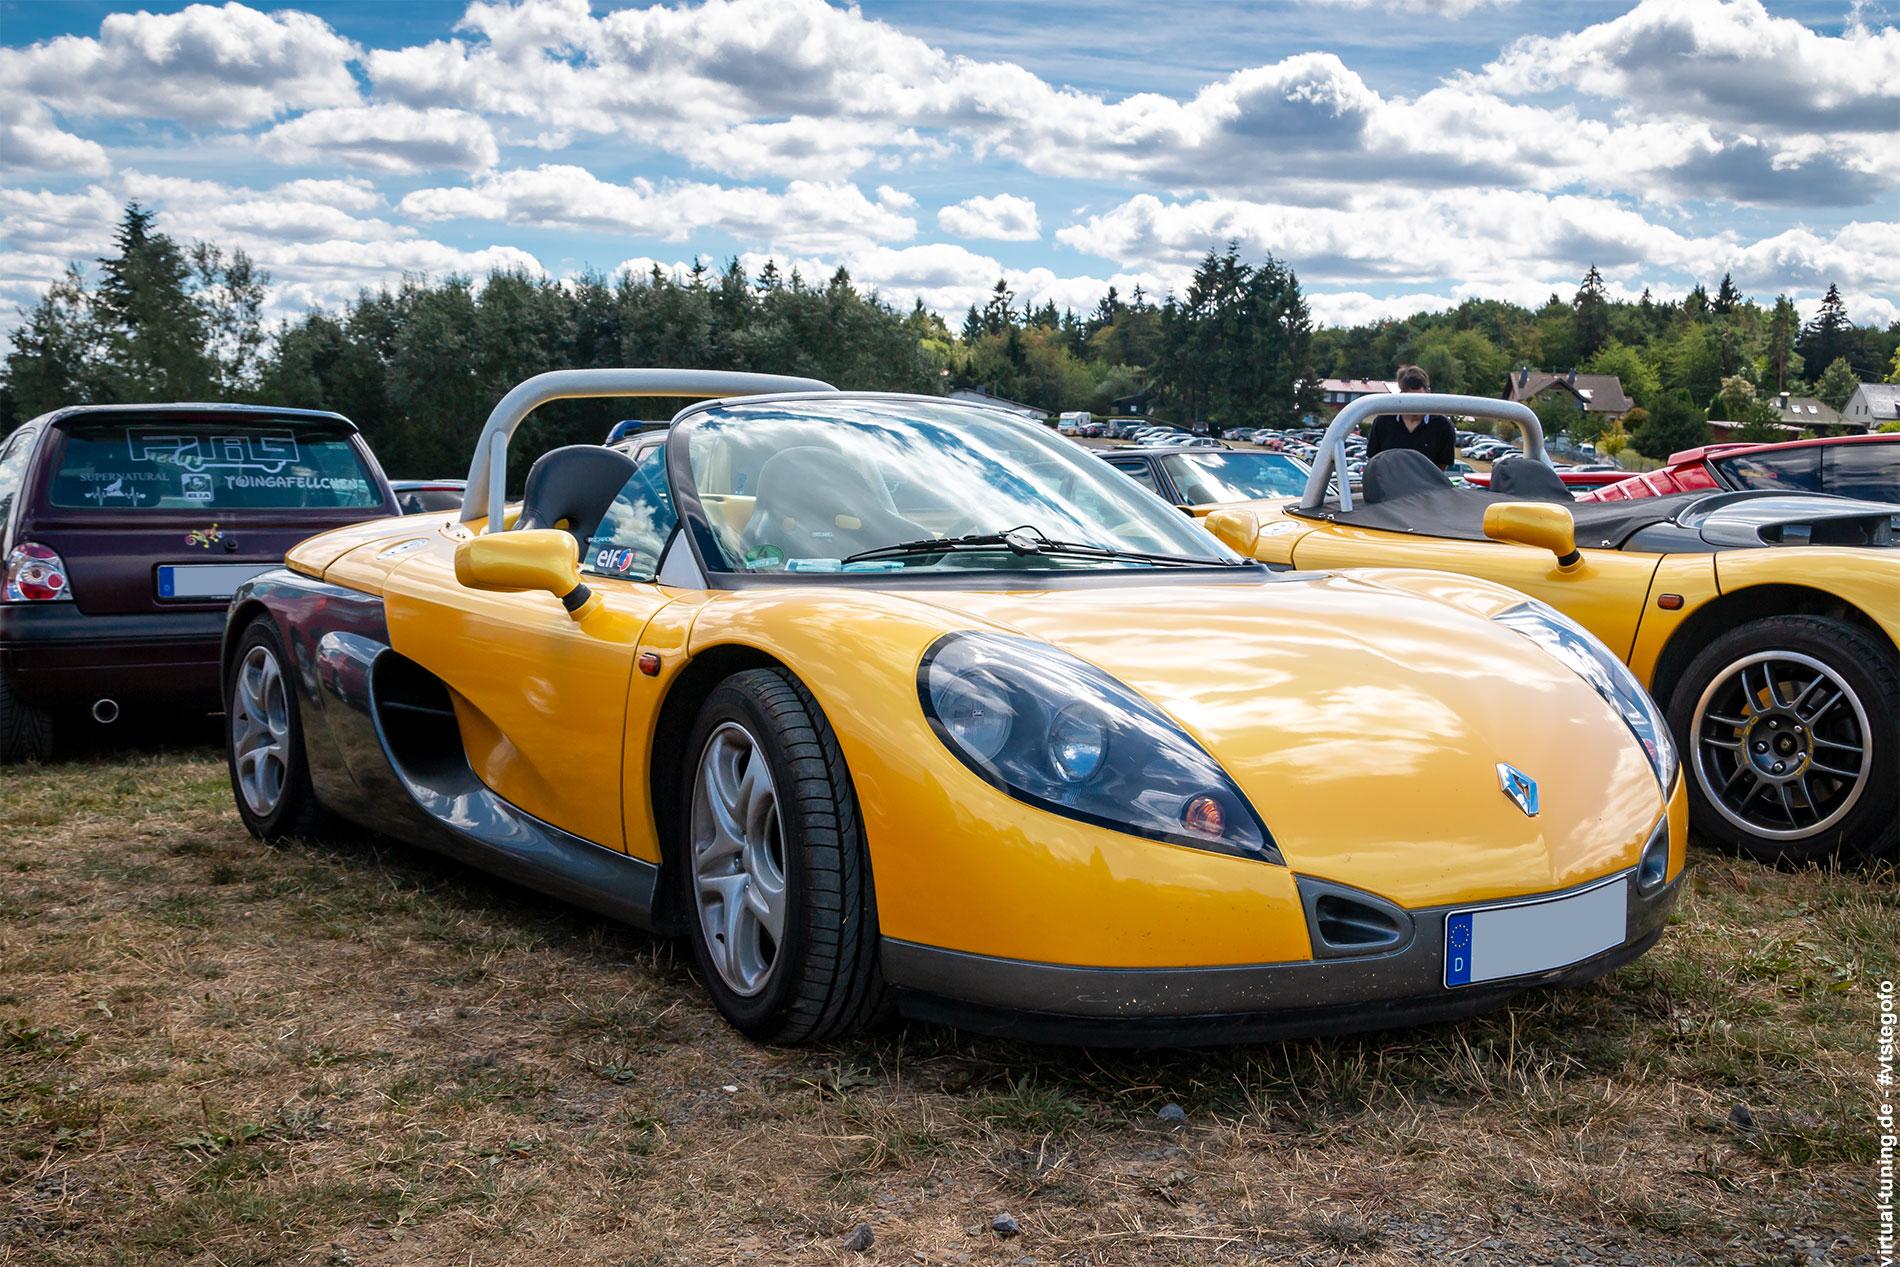 Renault Spider - D´ARC Sommertreffen am Nürburgring (08.2018)